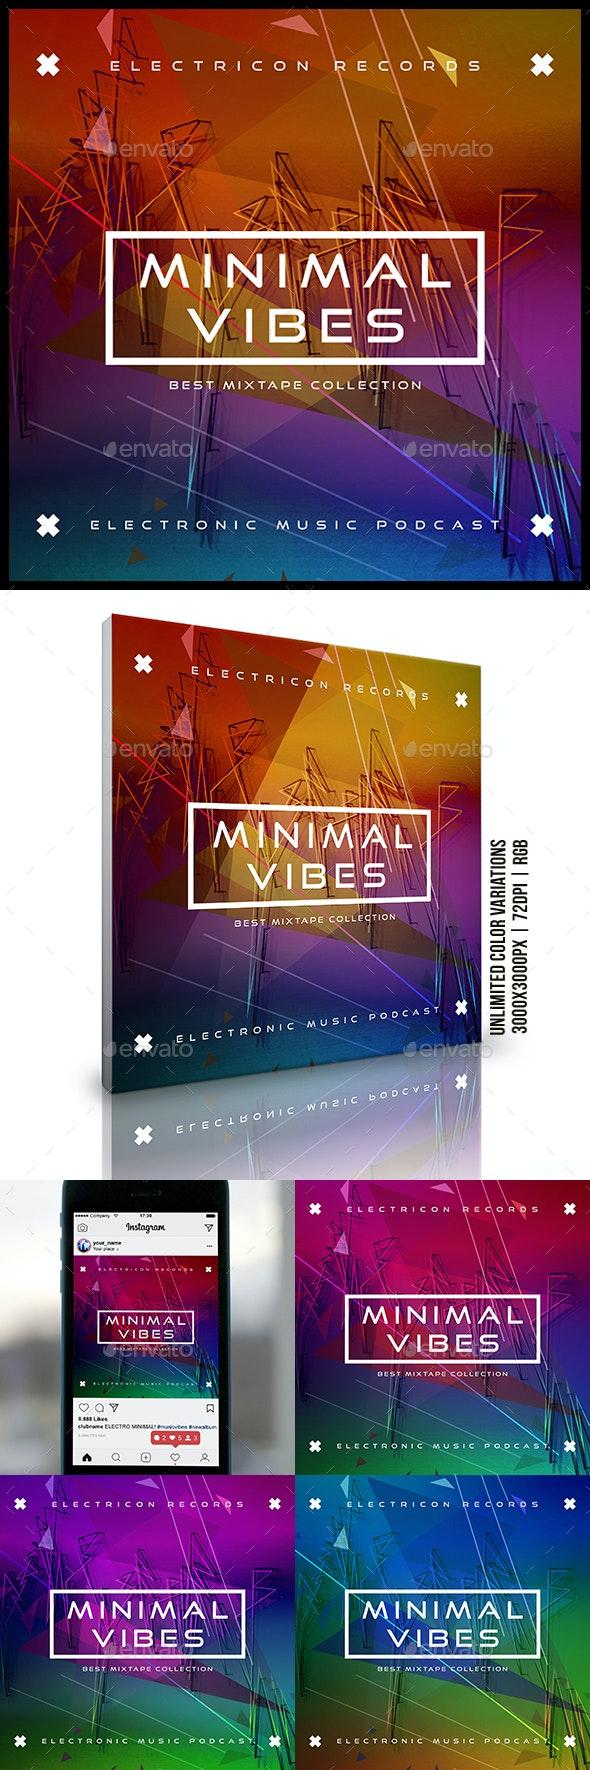 Minimal Vibes Electronic Music Album Cover Artwork Template - Miscellaneous Social Media